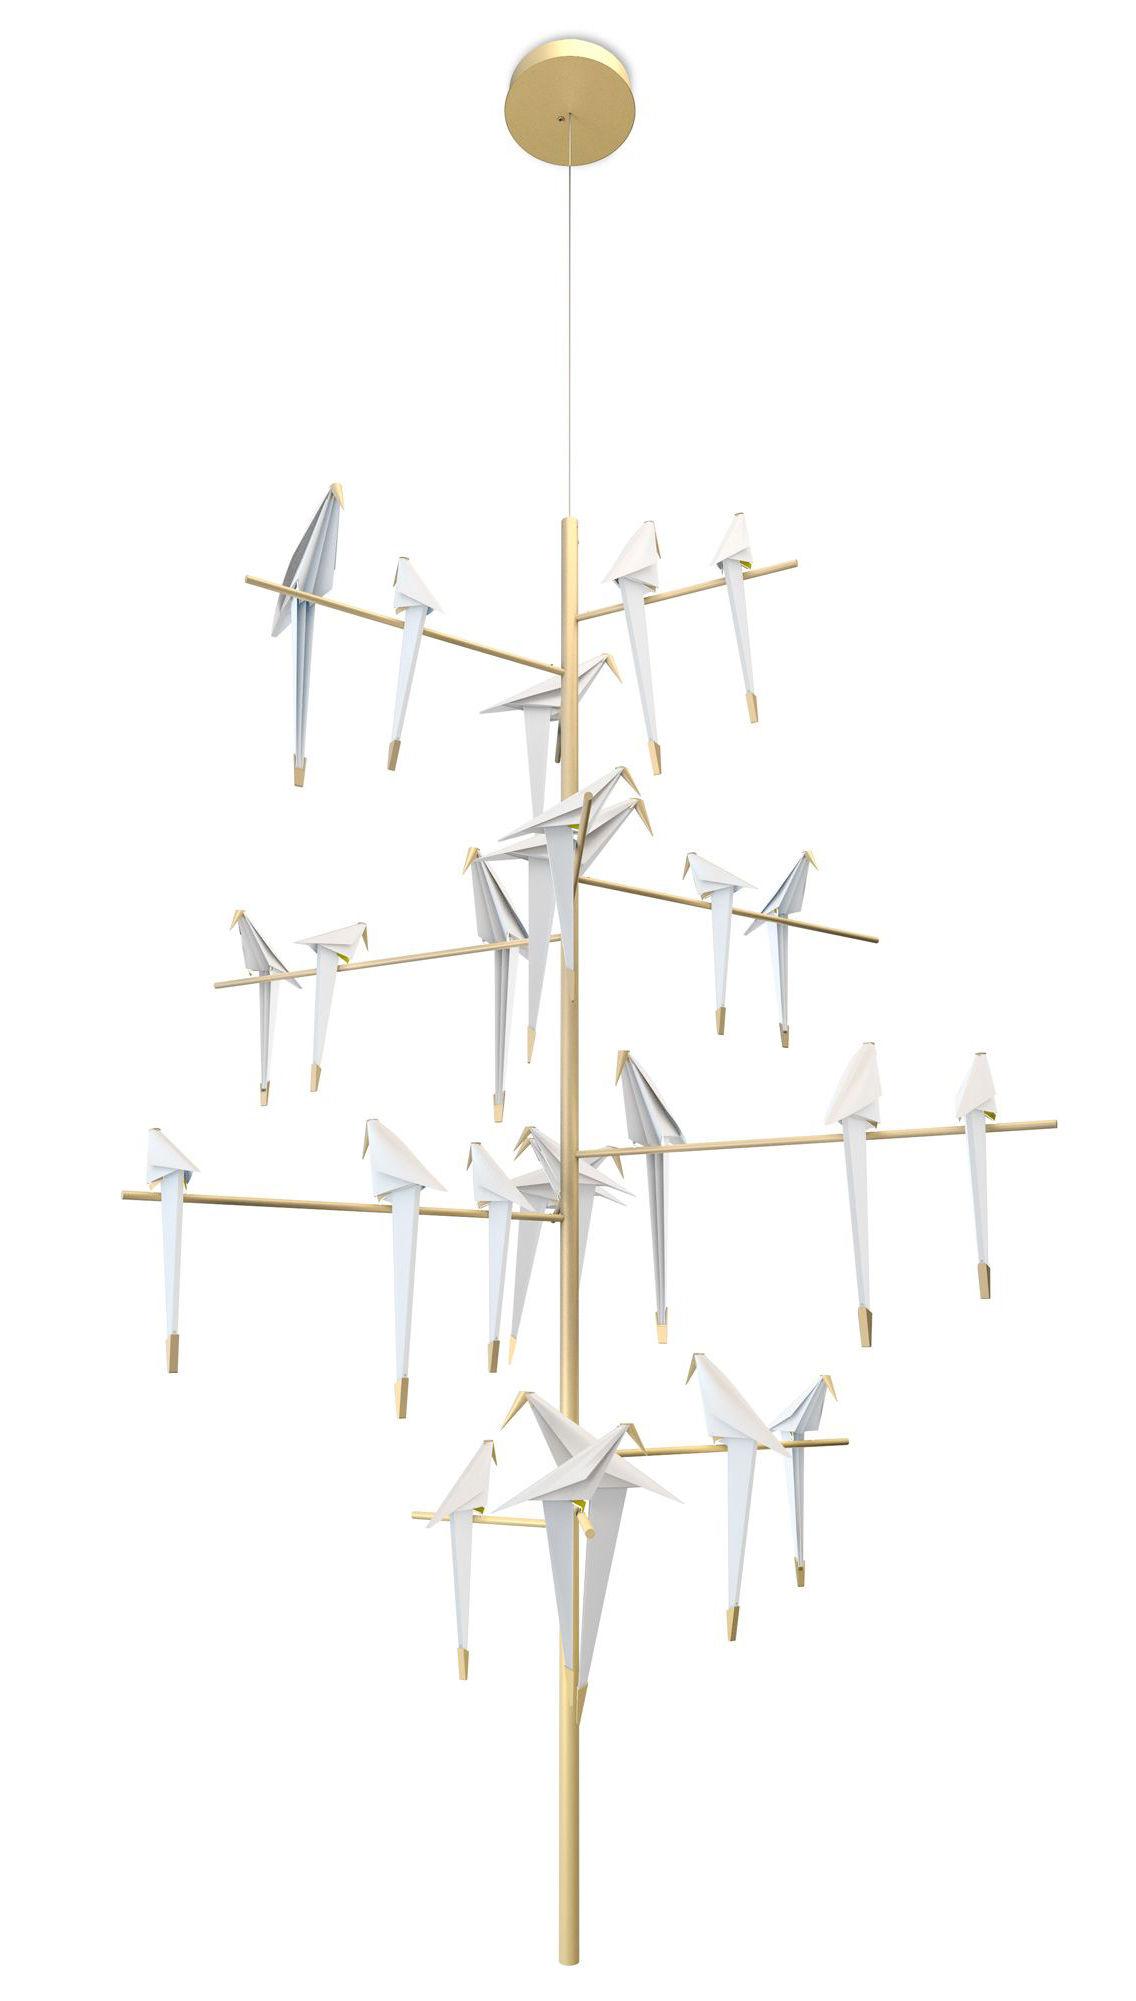 Lighting - Pendant Lighting - Perch Light Tree LED Pendant - Swiveling birds / Ø 170 x H 270 cm by Moooi - White & brass - Aluminium, Polypropylene, Steel